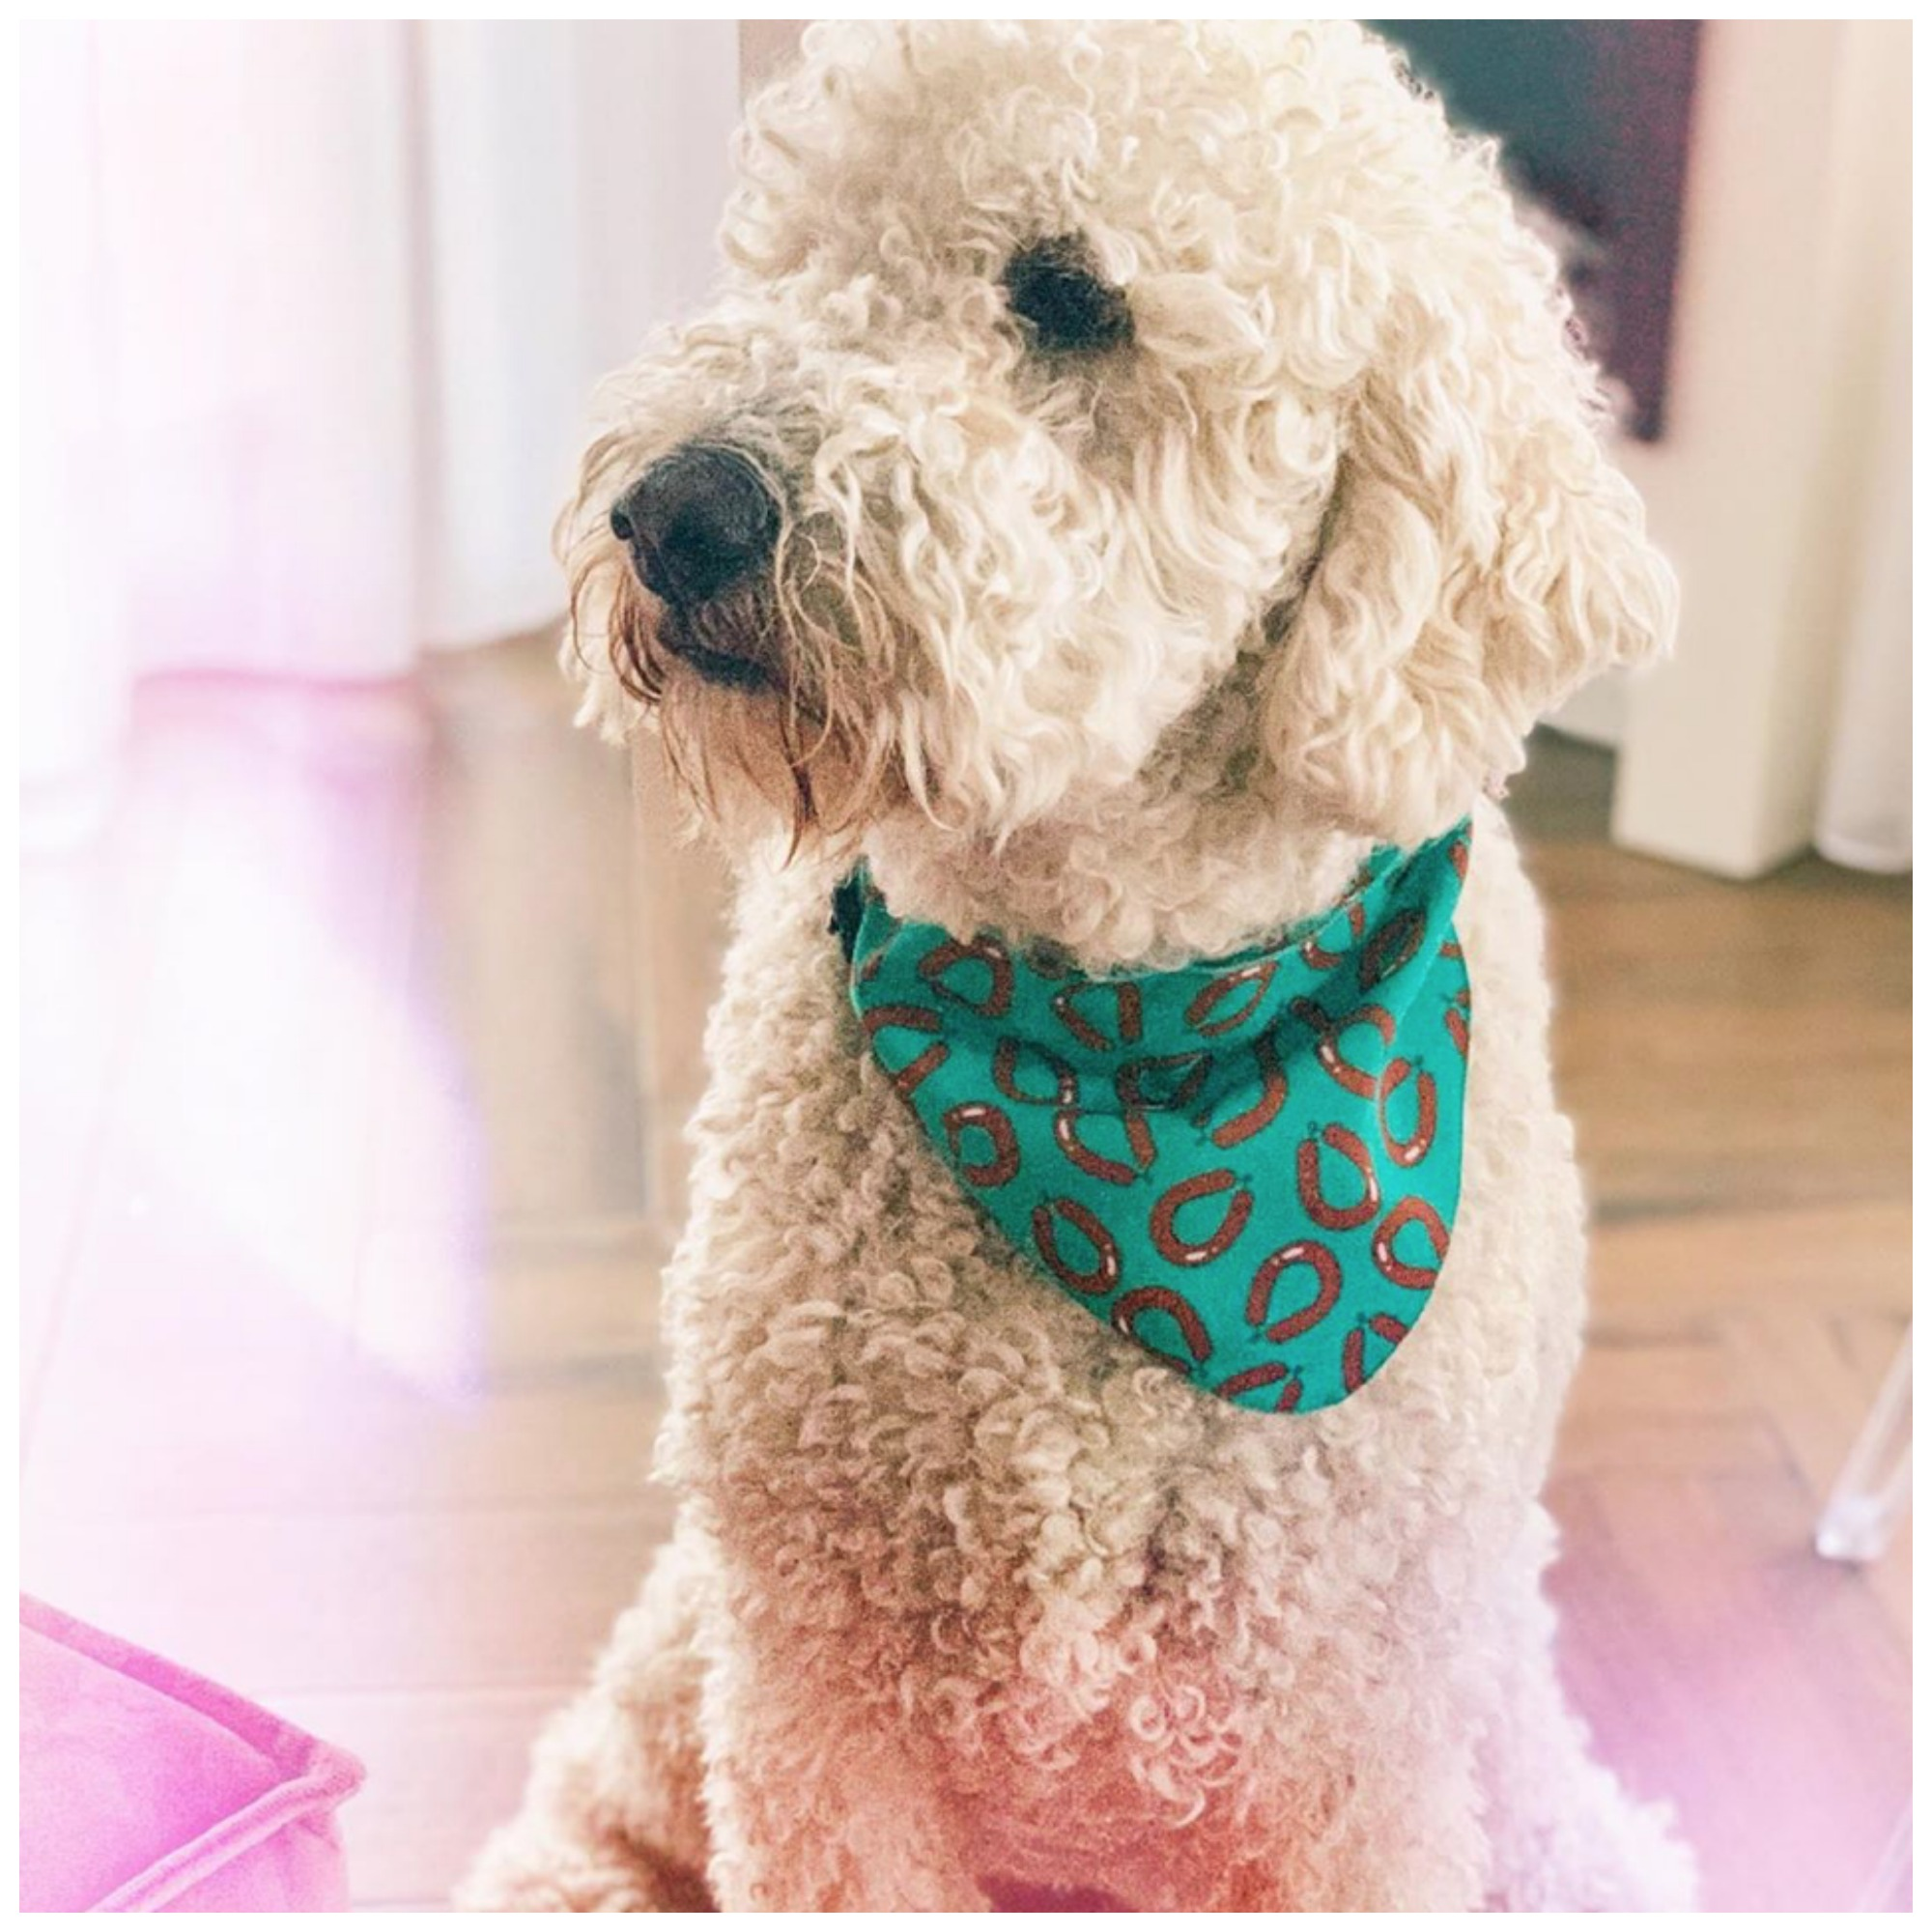 Hema hond rookworst bandana